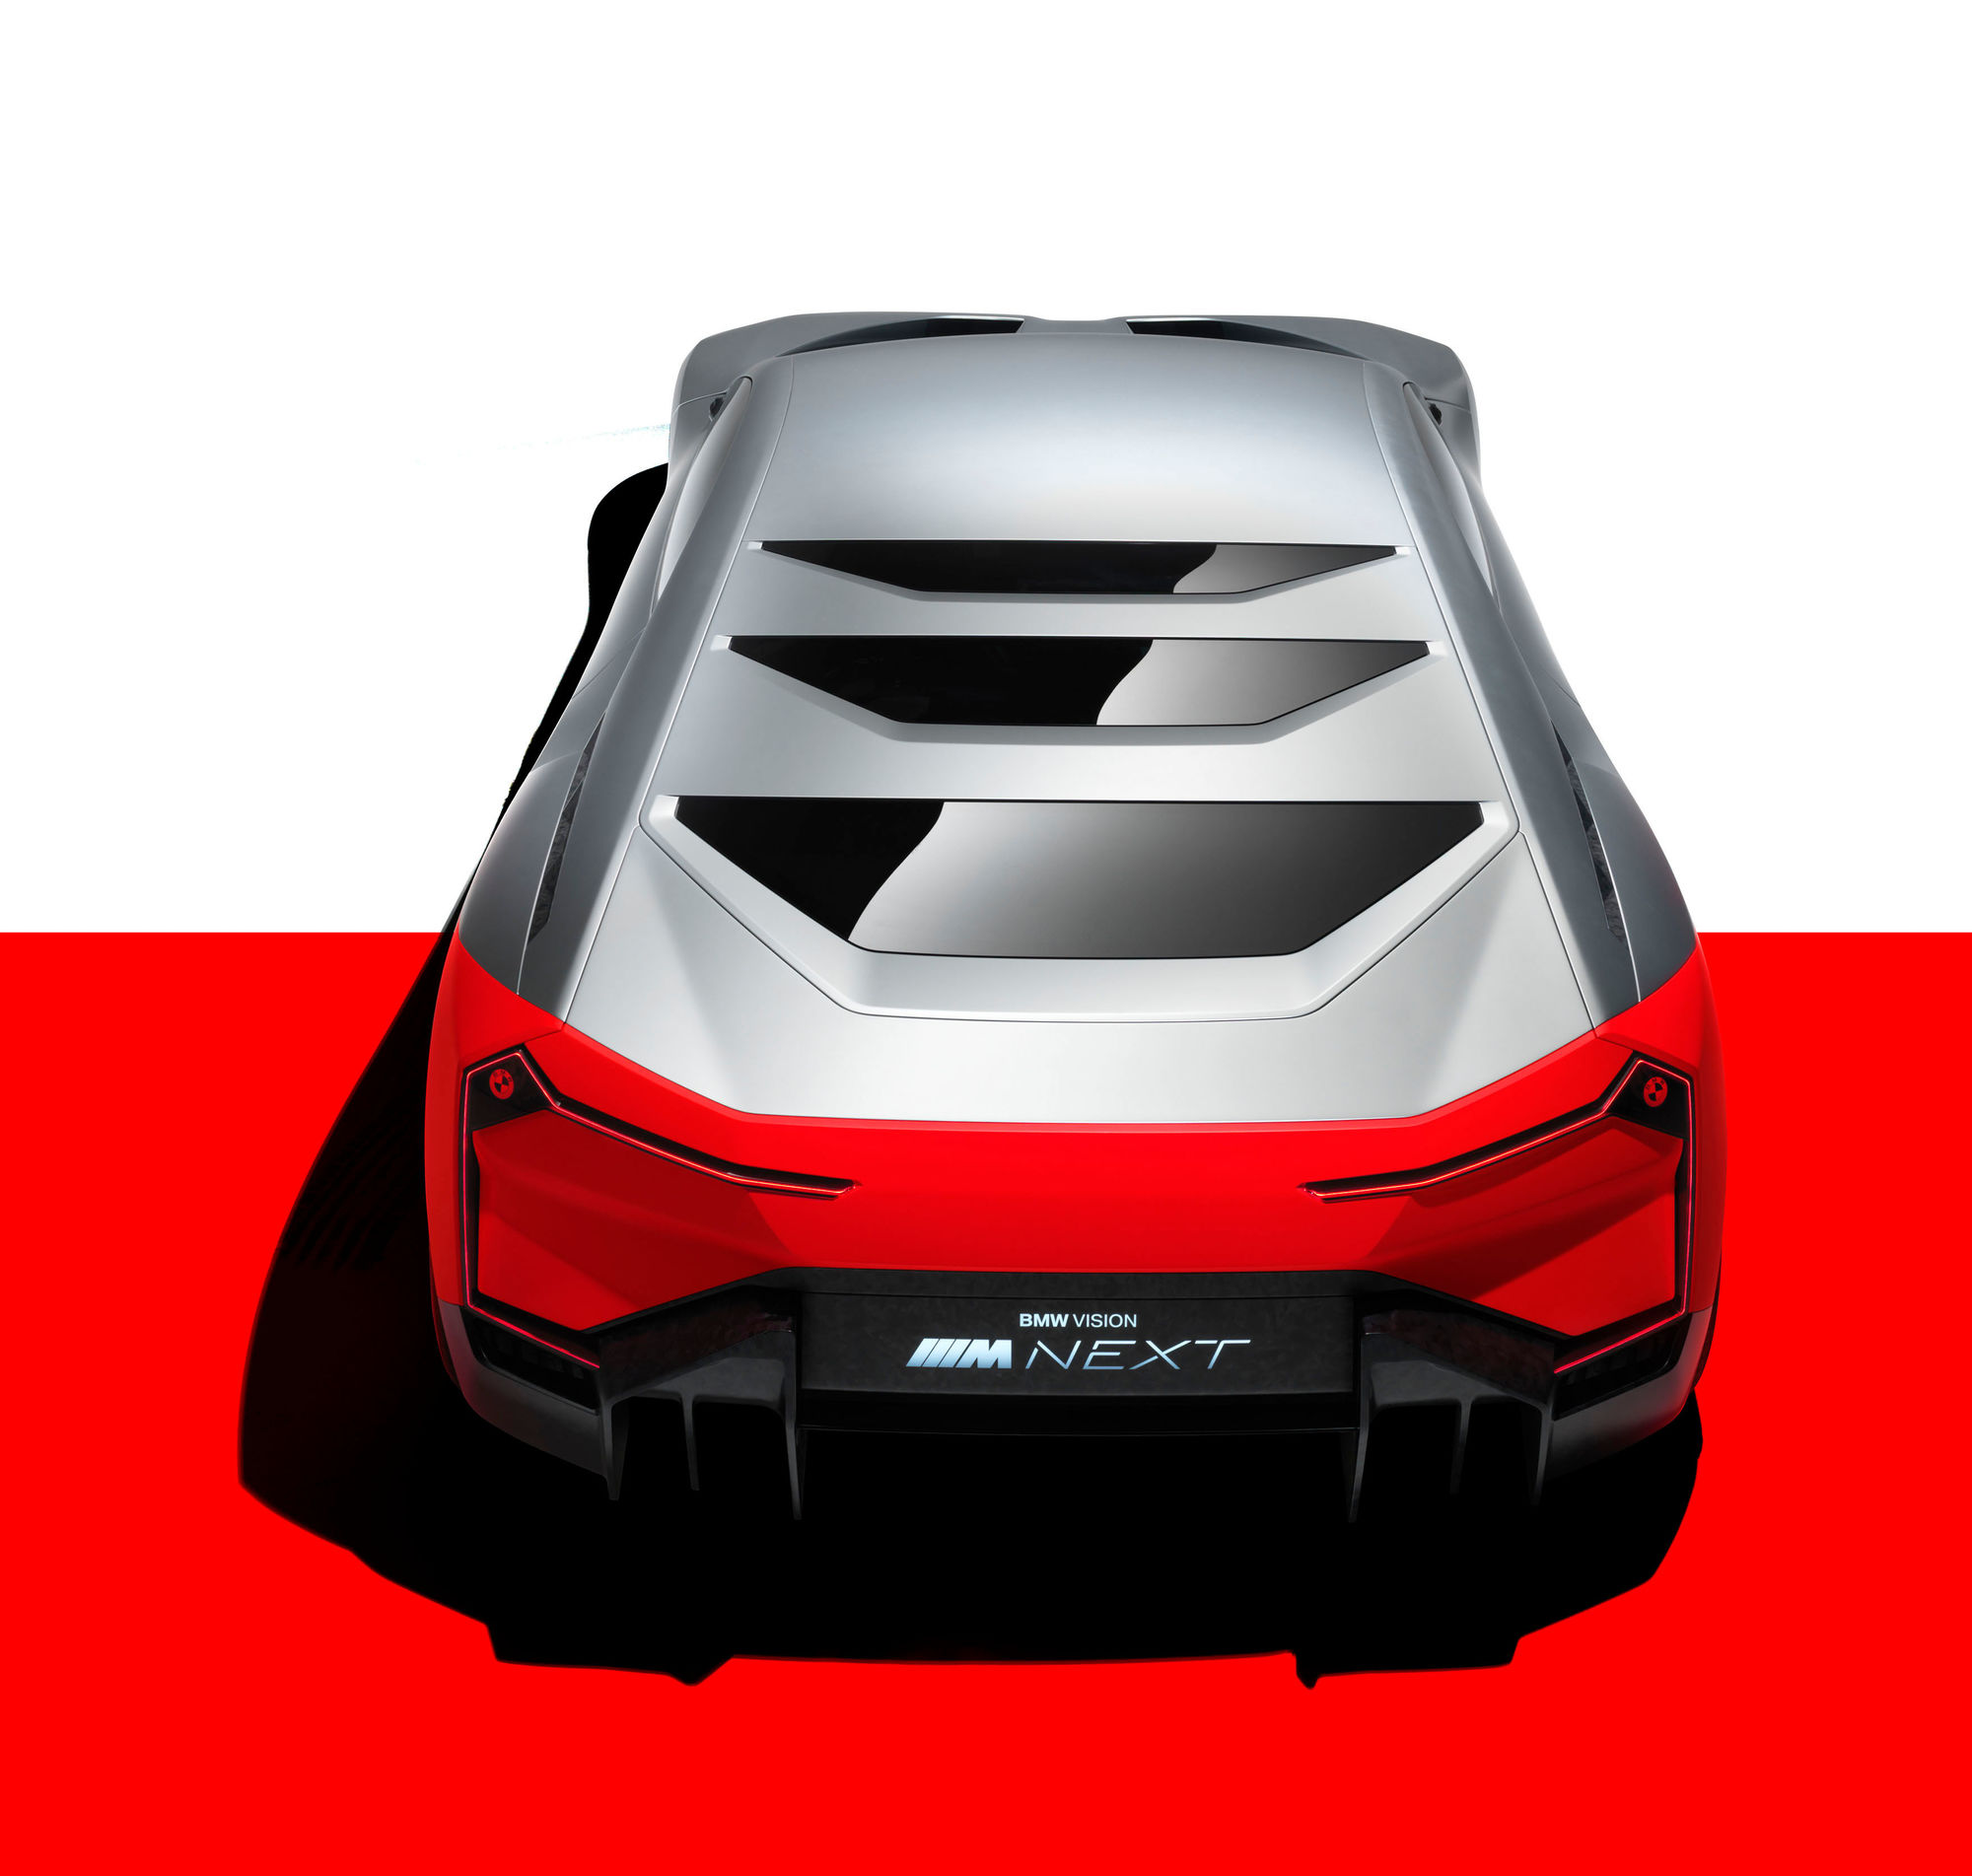 WE! SHOOT IT, BMW Vision M-Next, for RAMP DESIGN